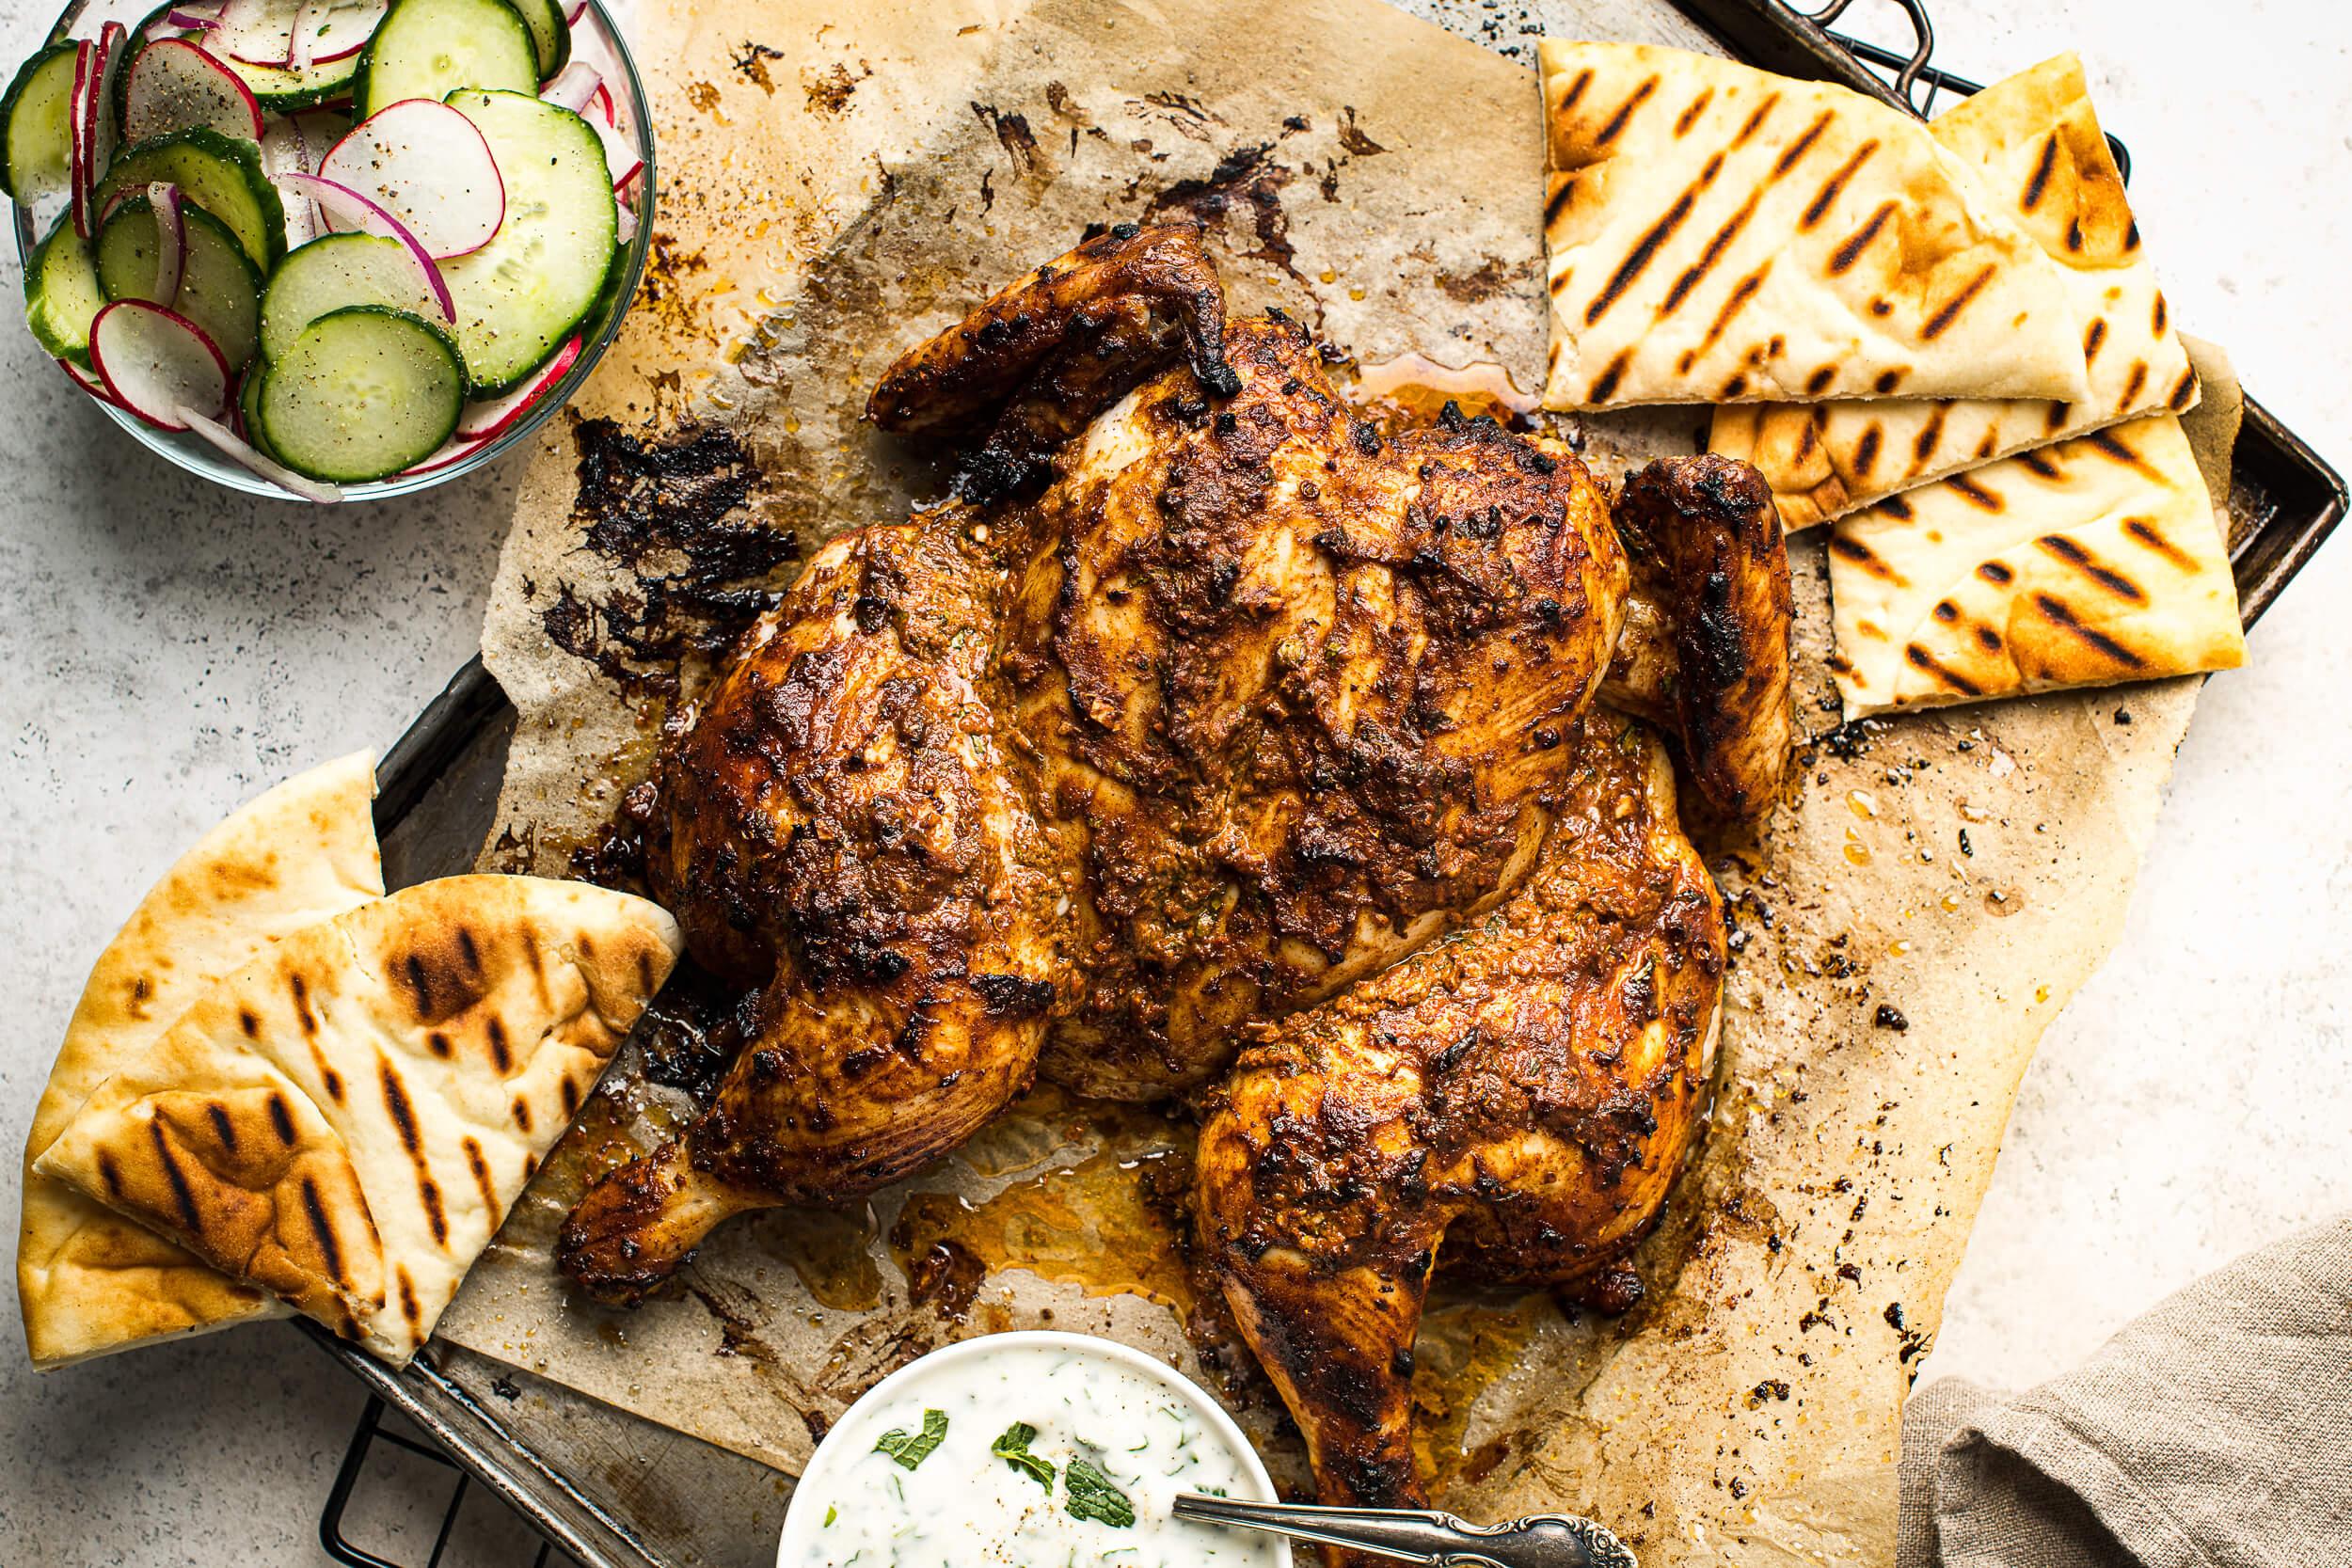 Spatchcocked Tandoori-Style Chicken with Cucumber Salad & Naan